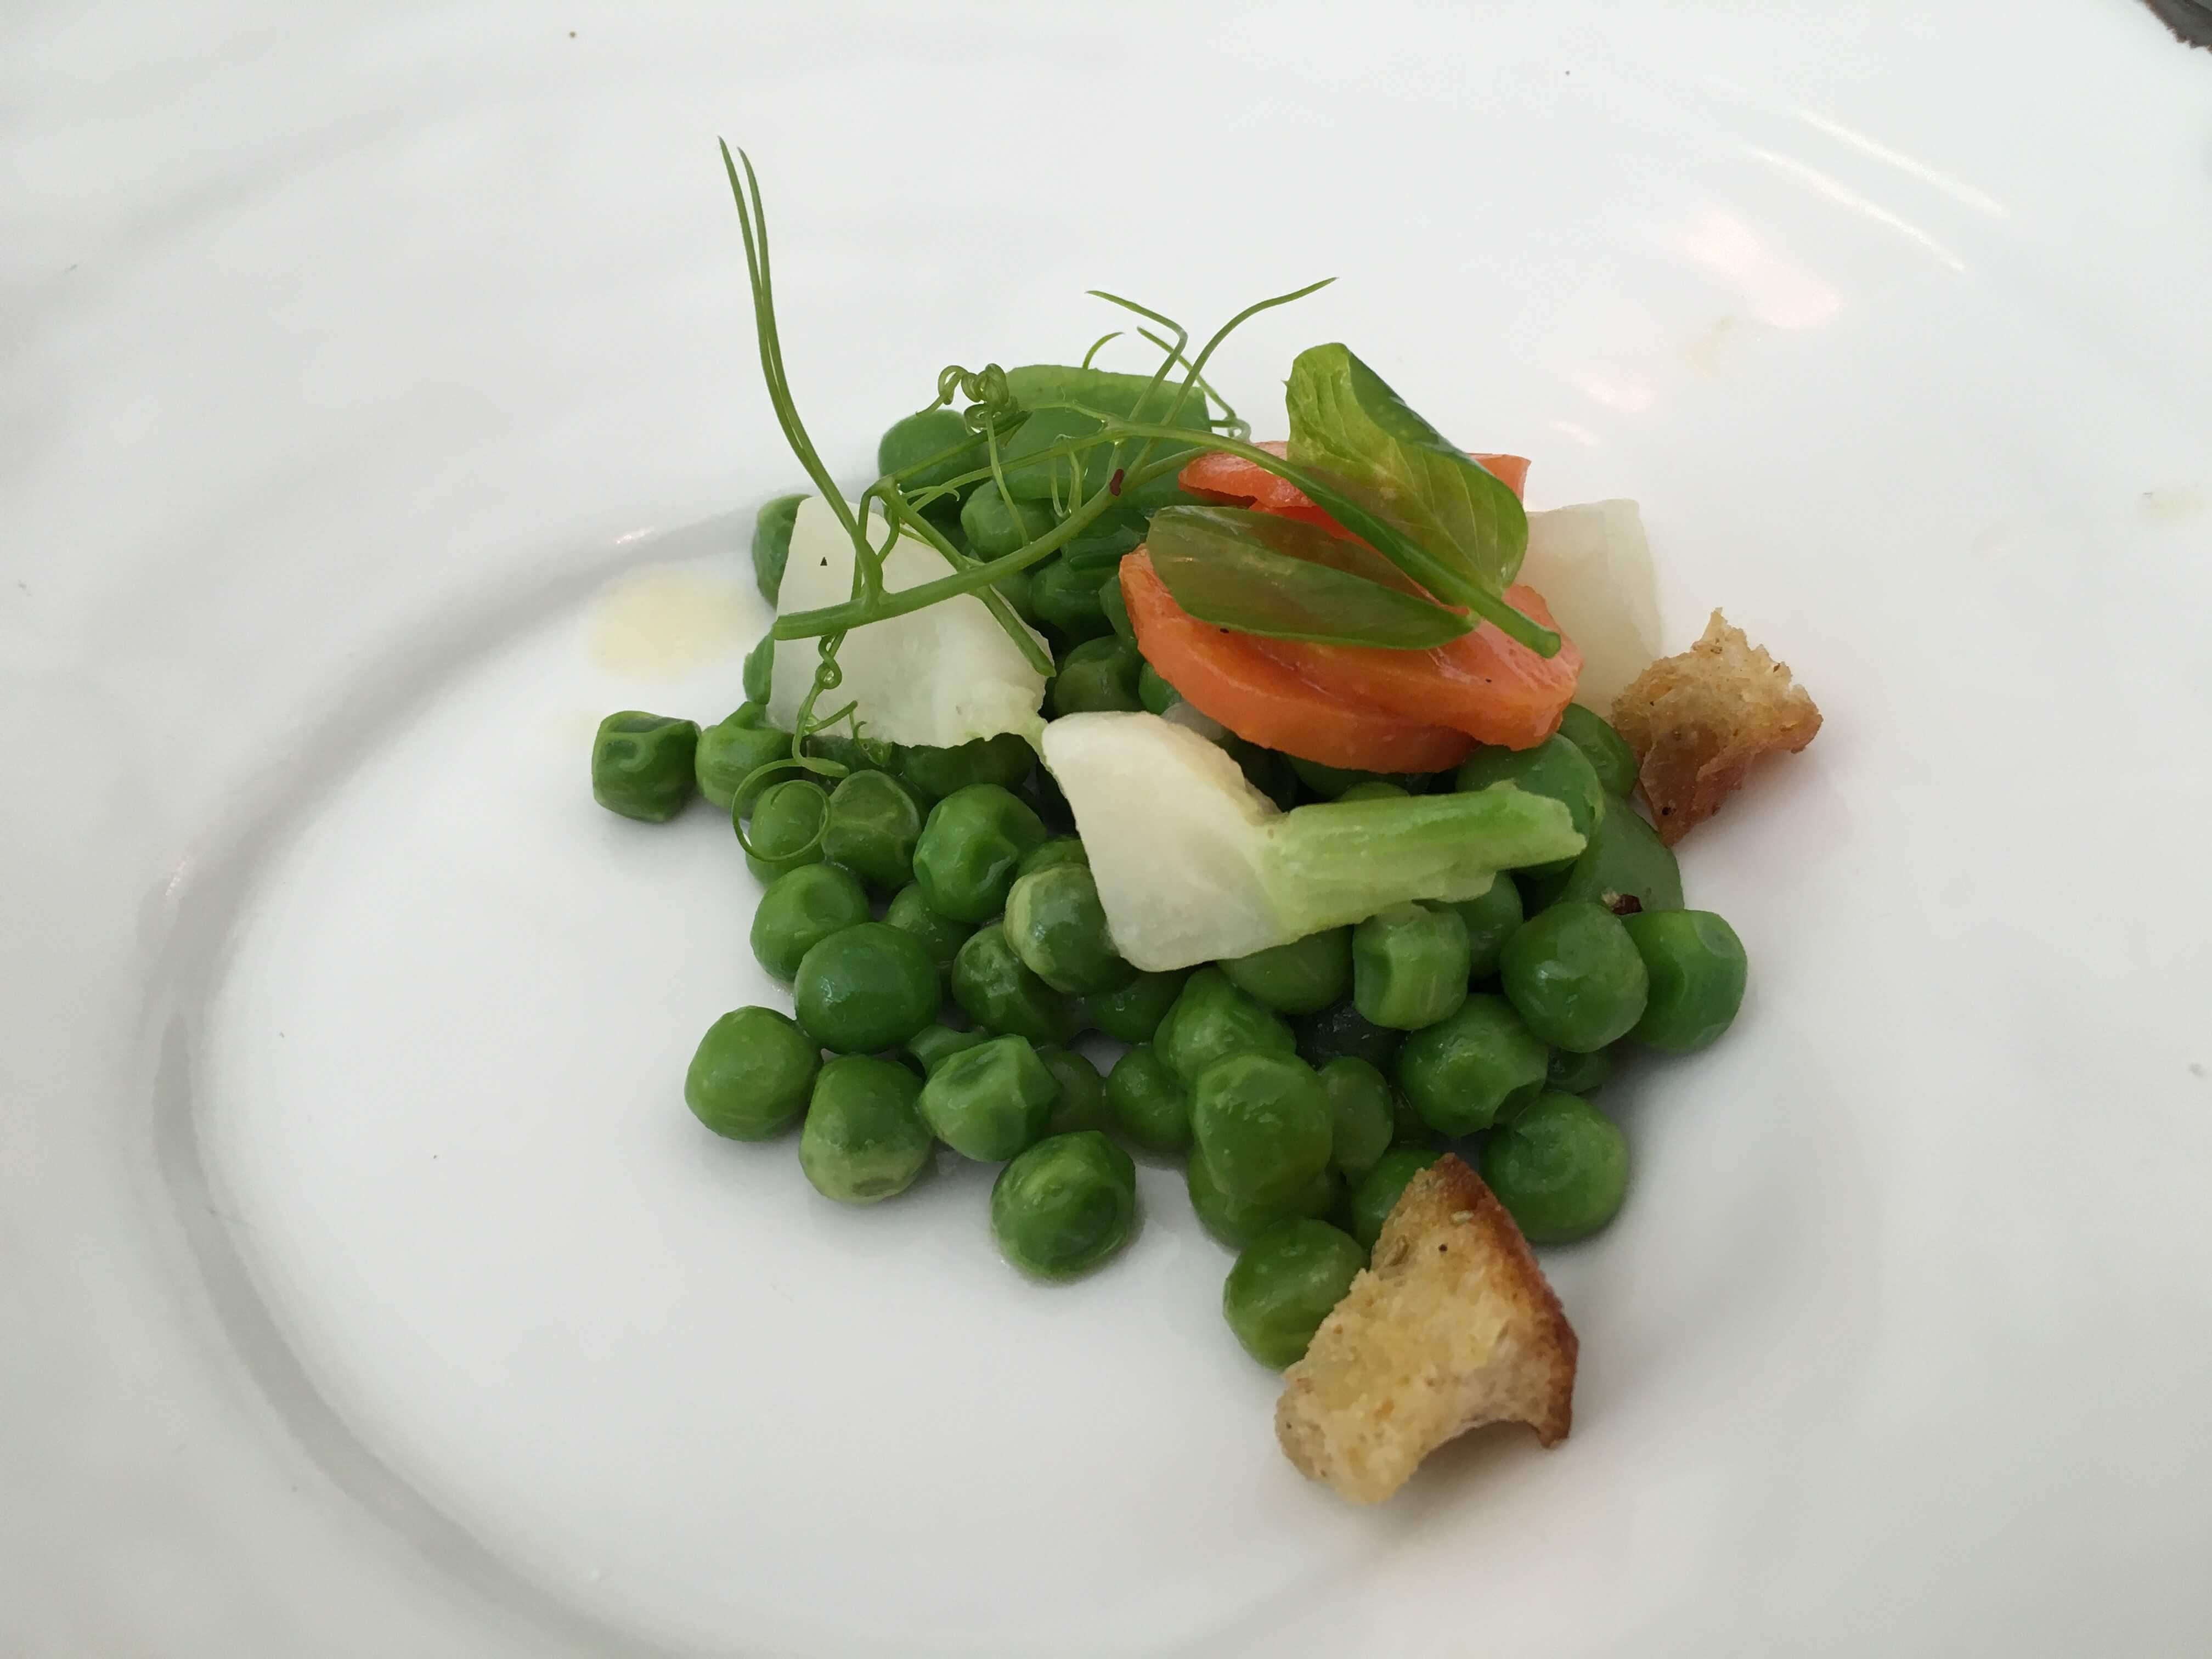 Soupe de Petits pois (before soup). English pea, carrot, mint, crostini.